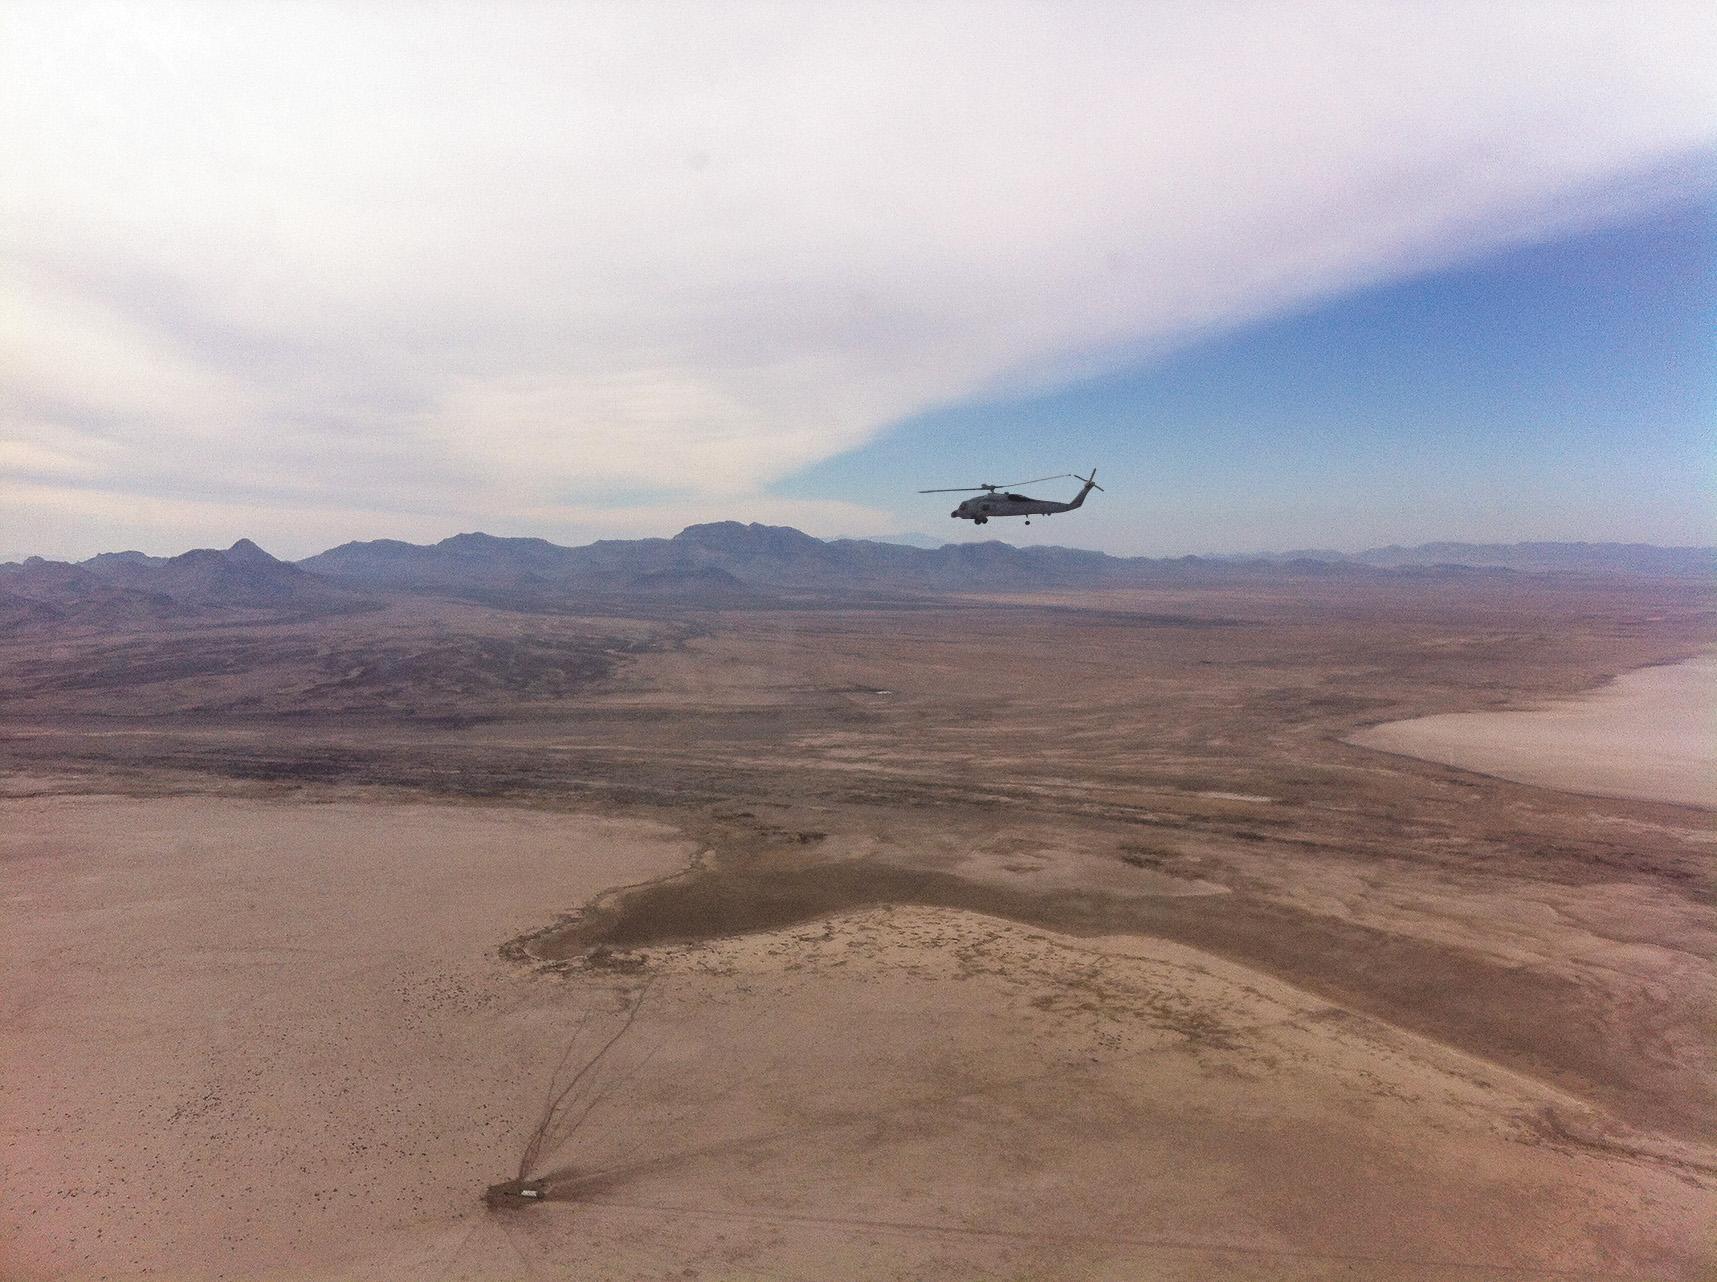 A Sikorsky SH-60B Seahawk